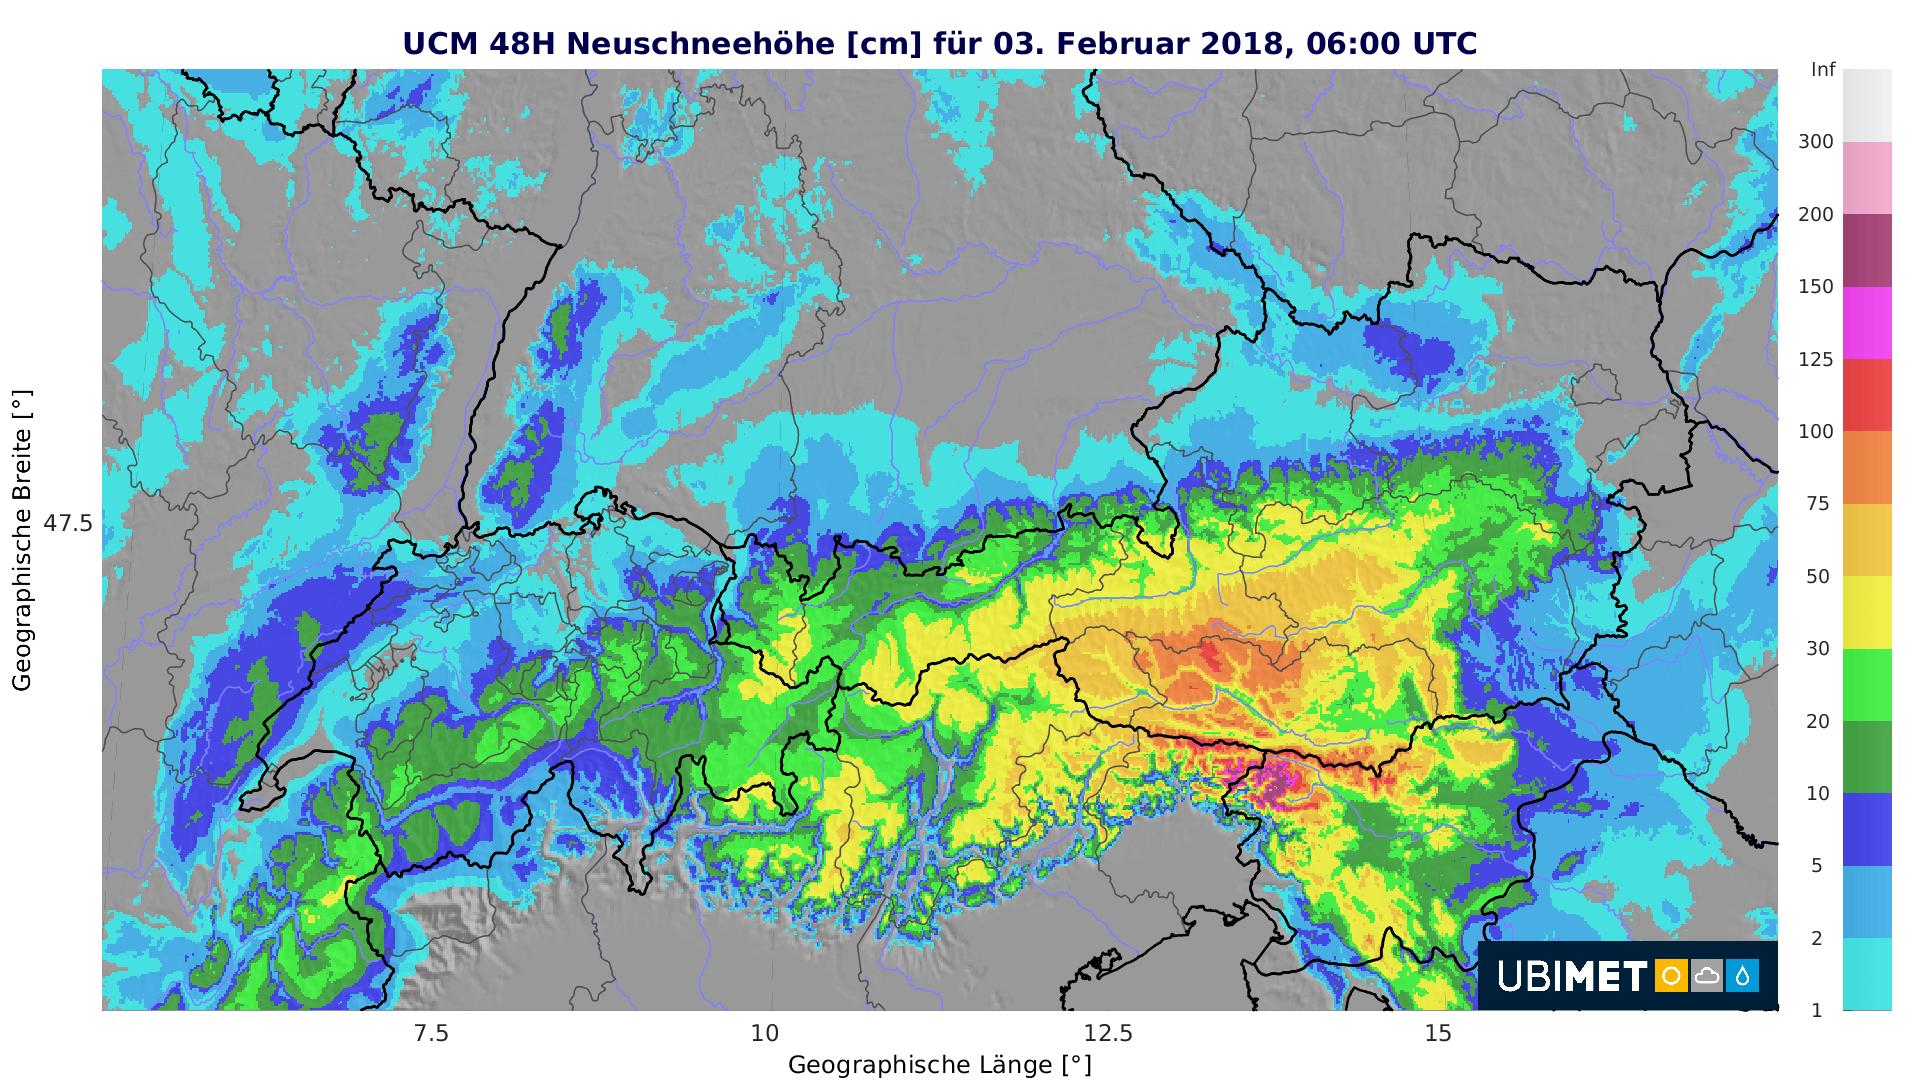 Schneeprognose bis Samstagmorgen. © UBIMET